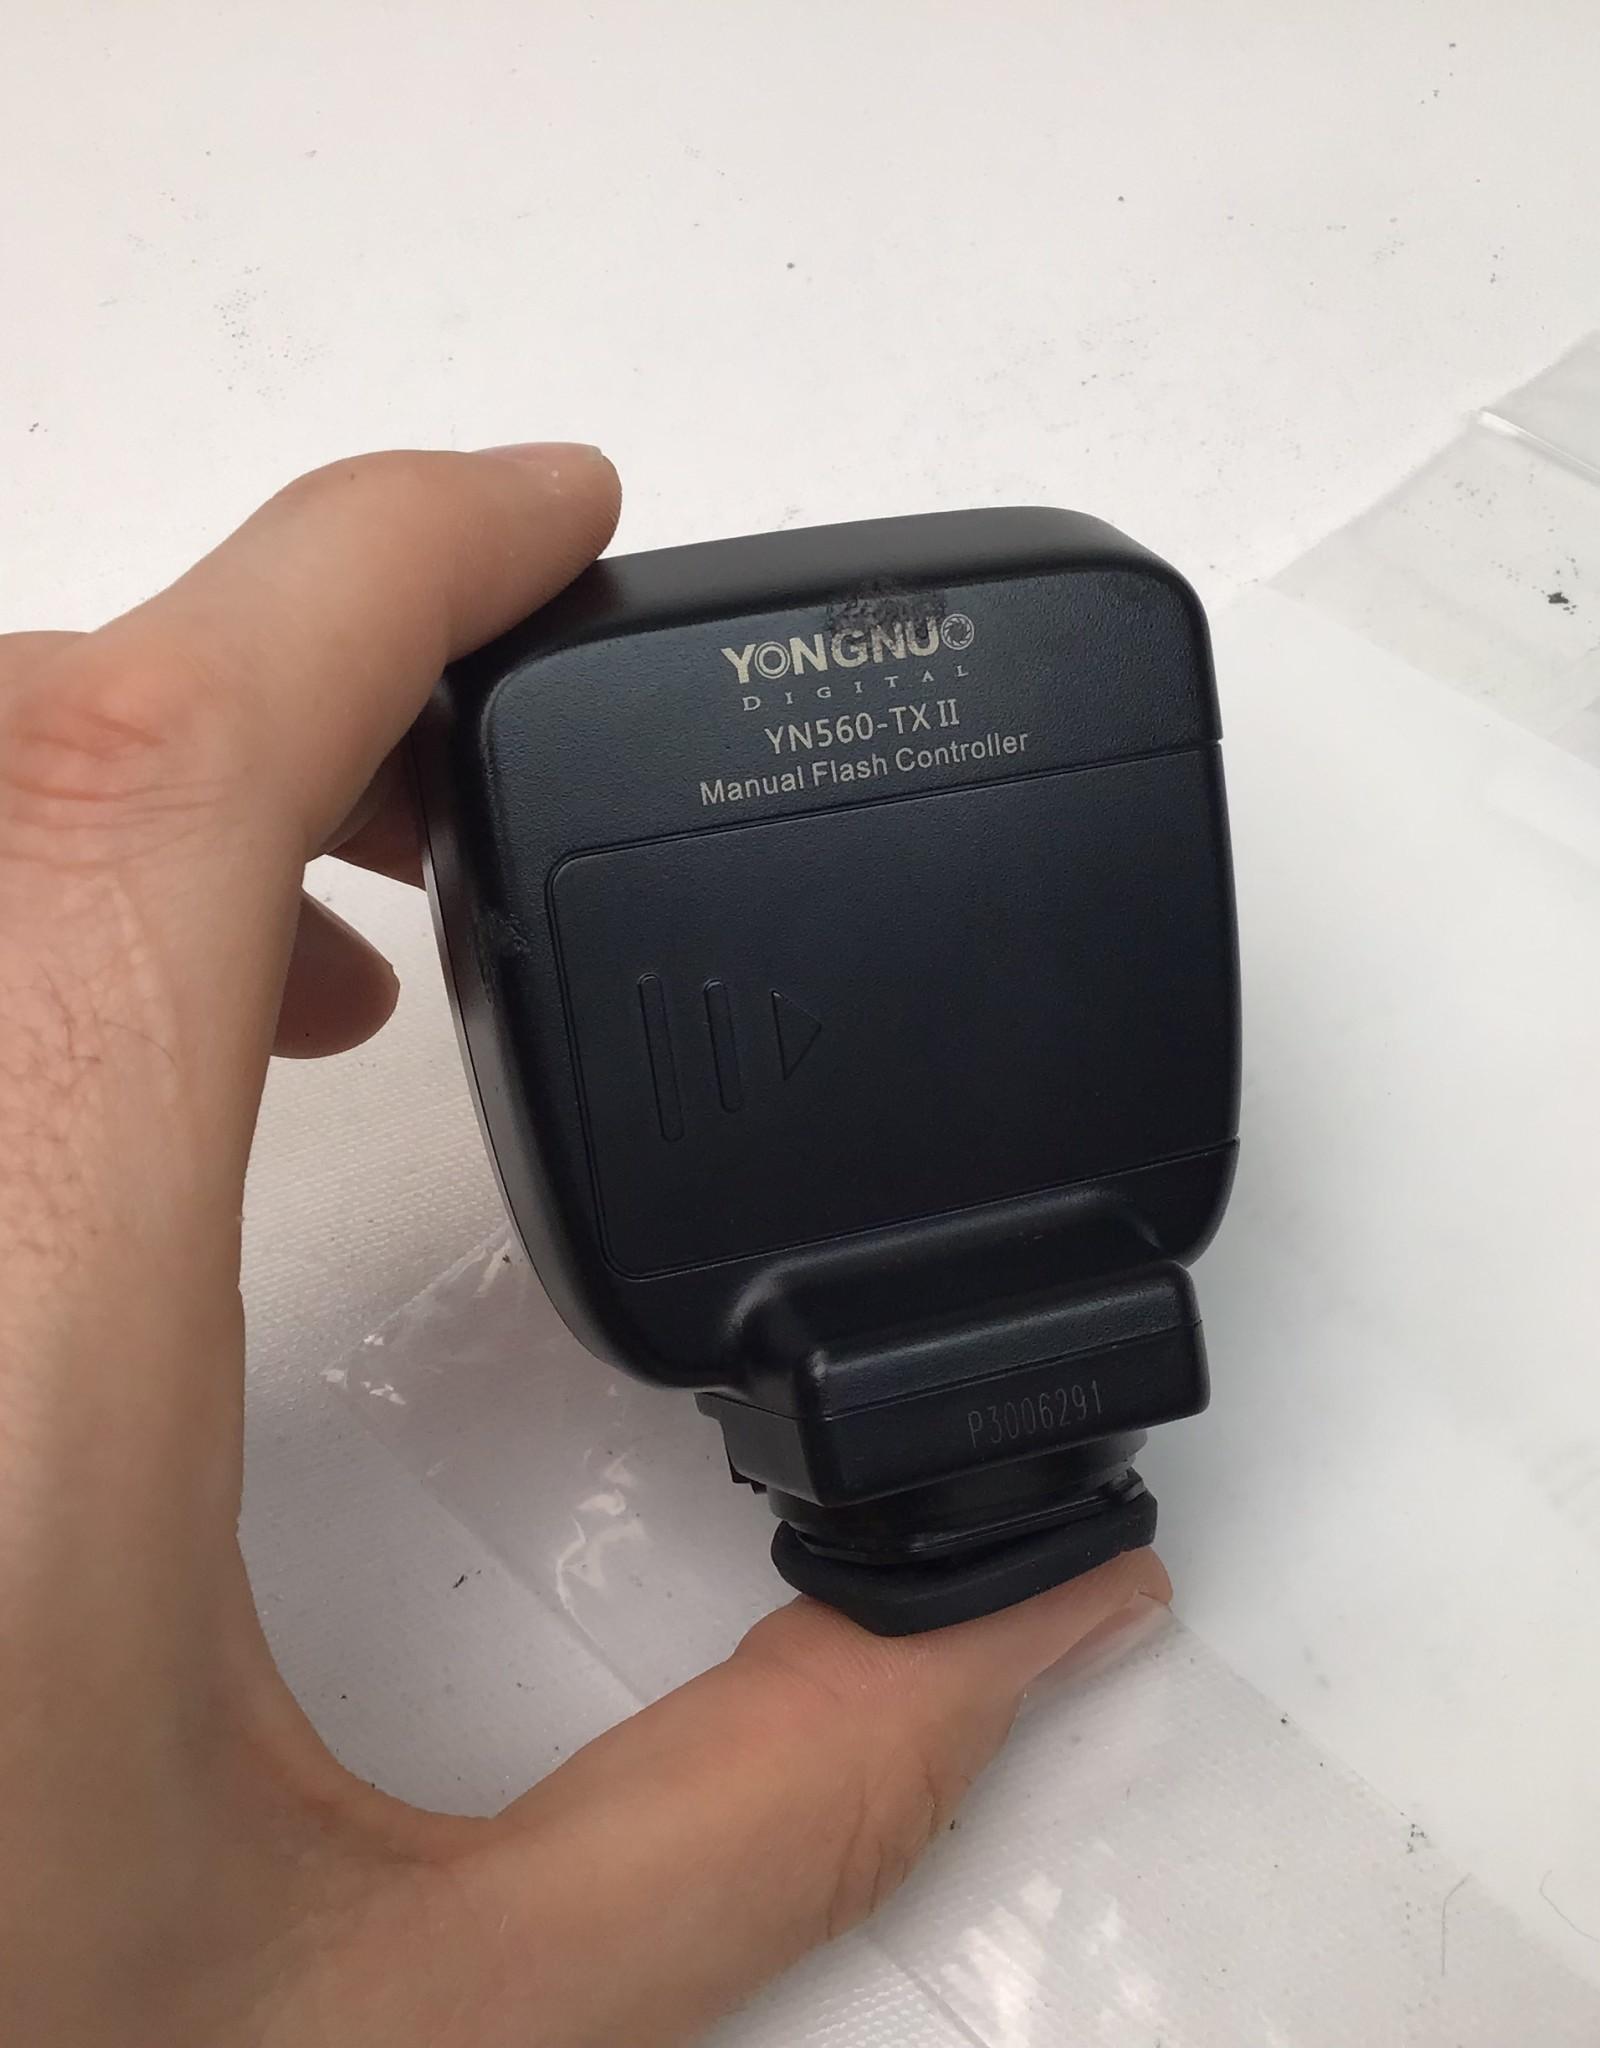 YONGNUO Yongnuo YN560-TX II Flash Controller Used Good